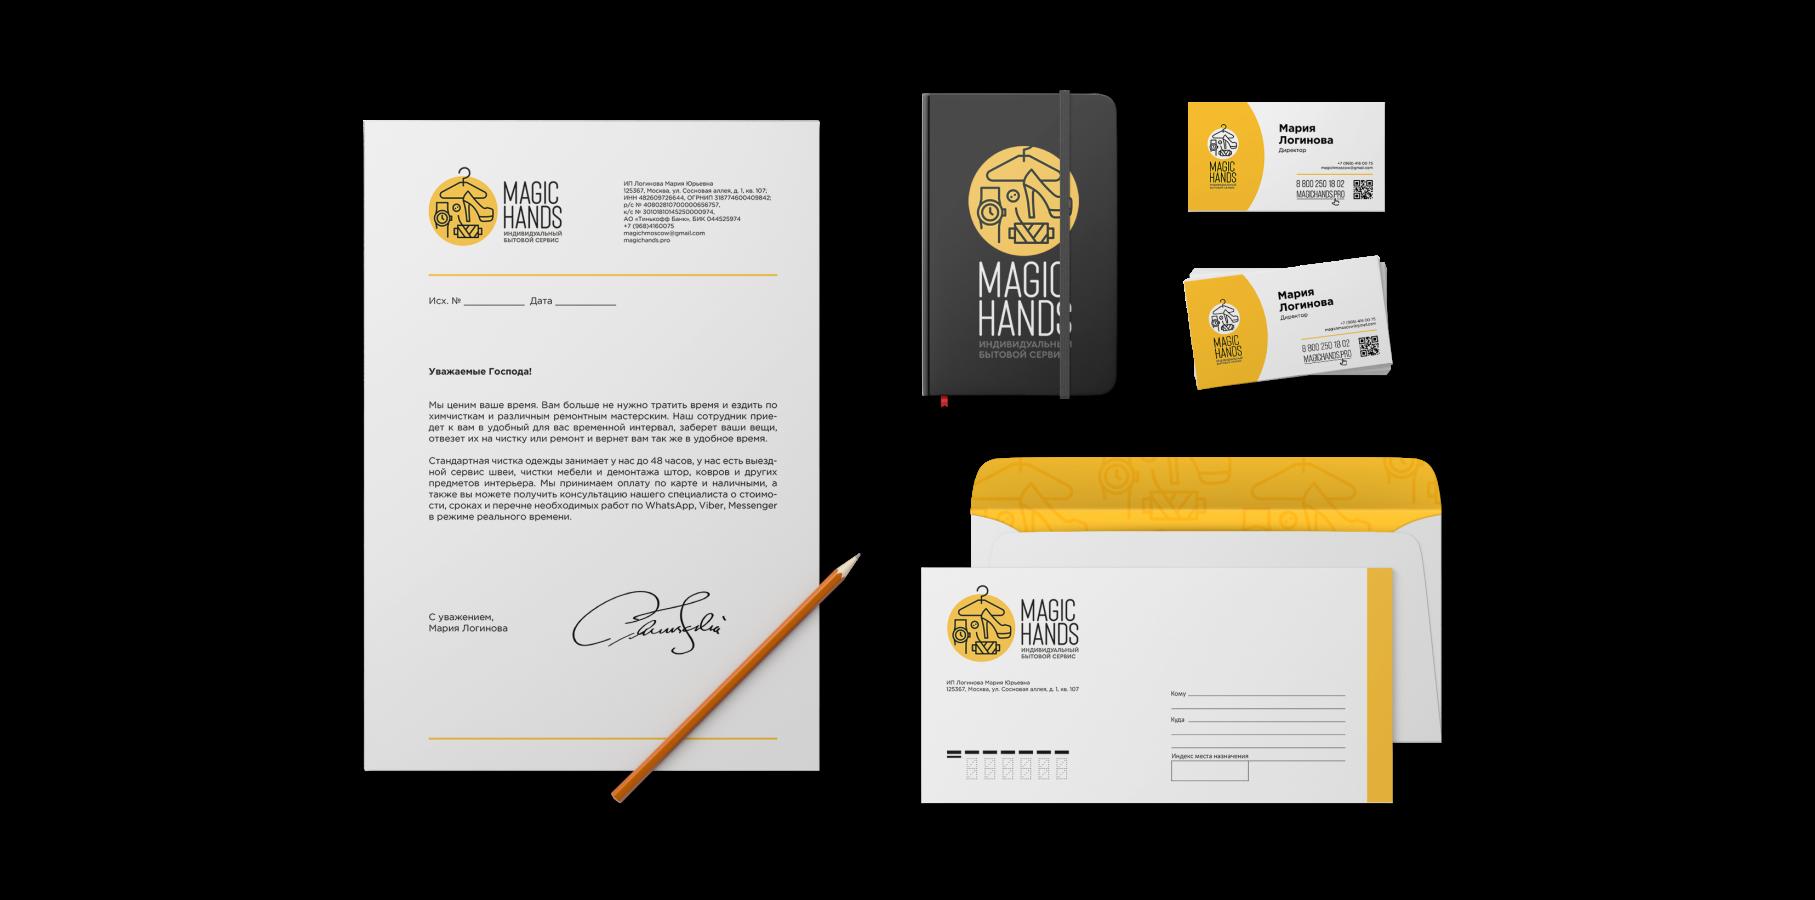 Magic Hands - HMS Brands - кейсы, брендинг - бизнес-набор